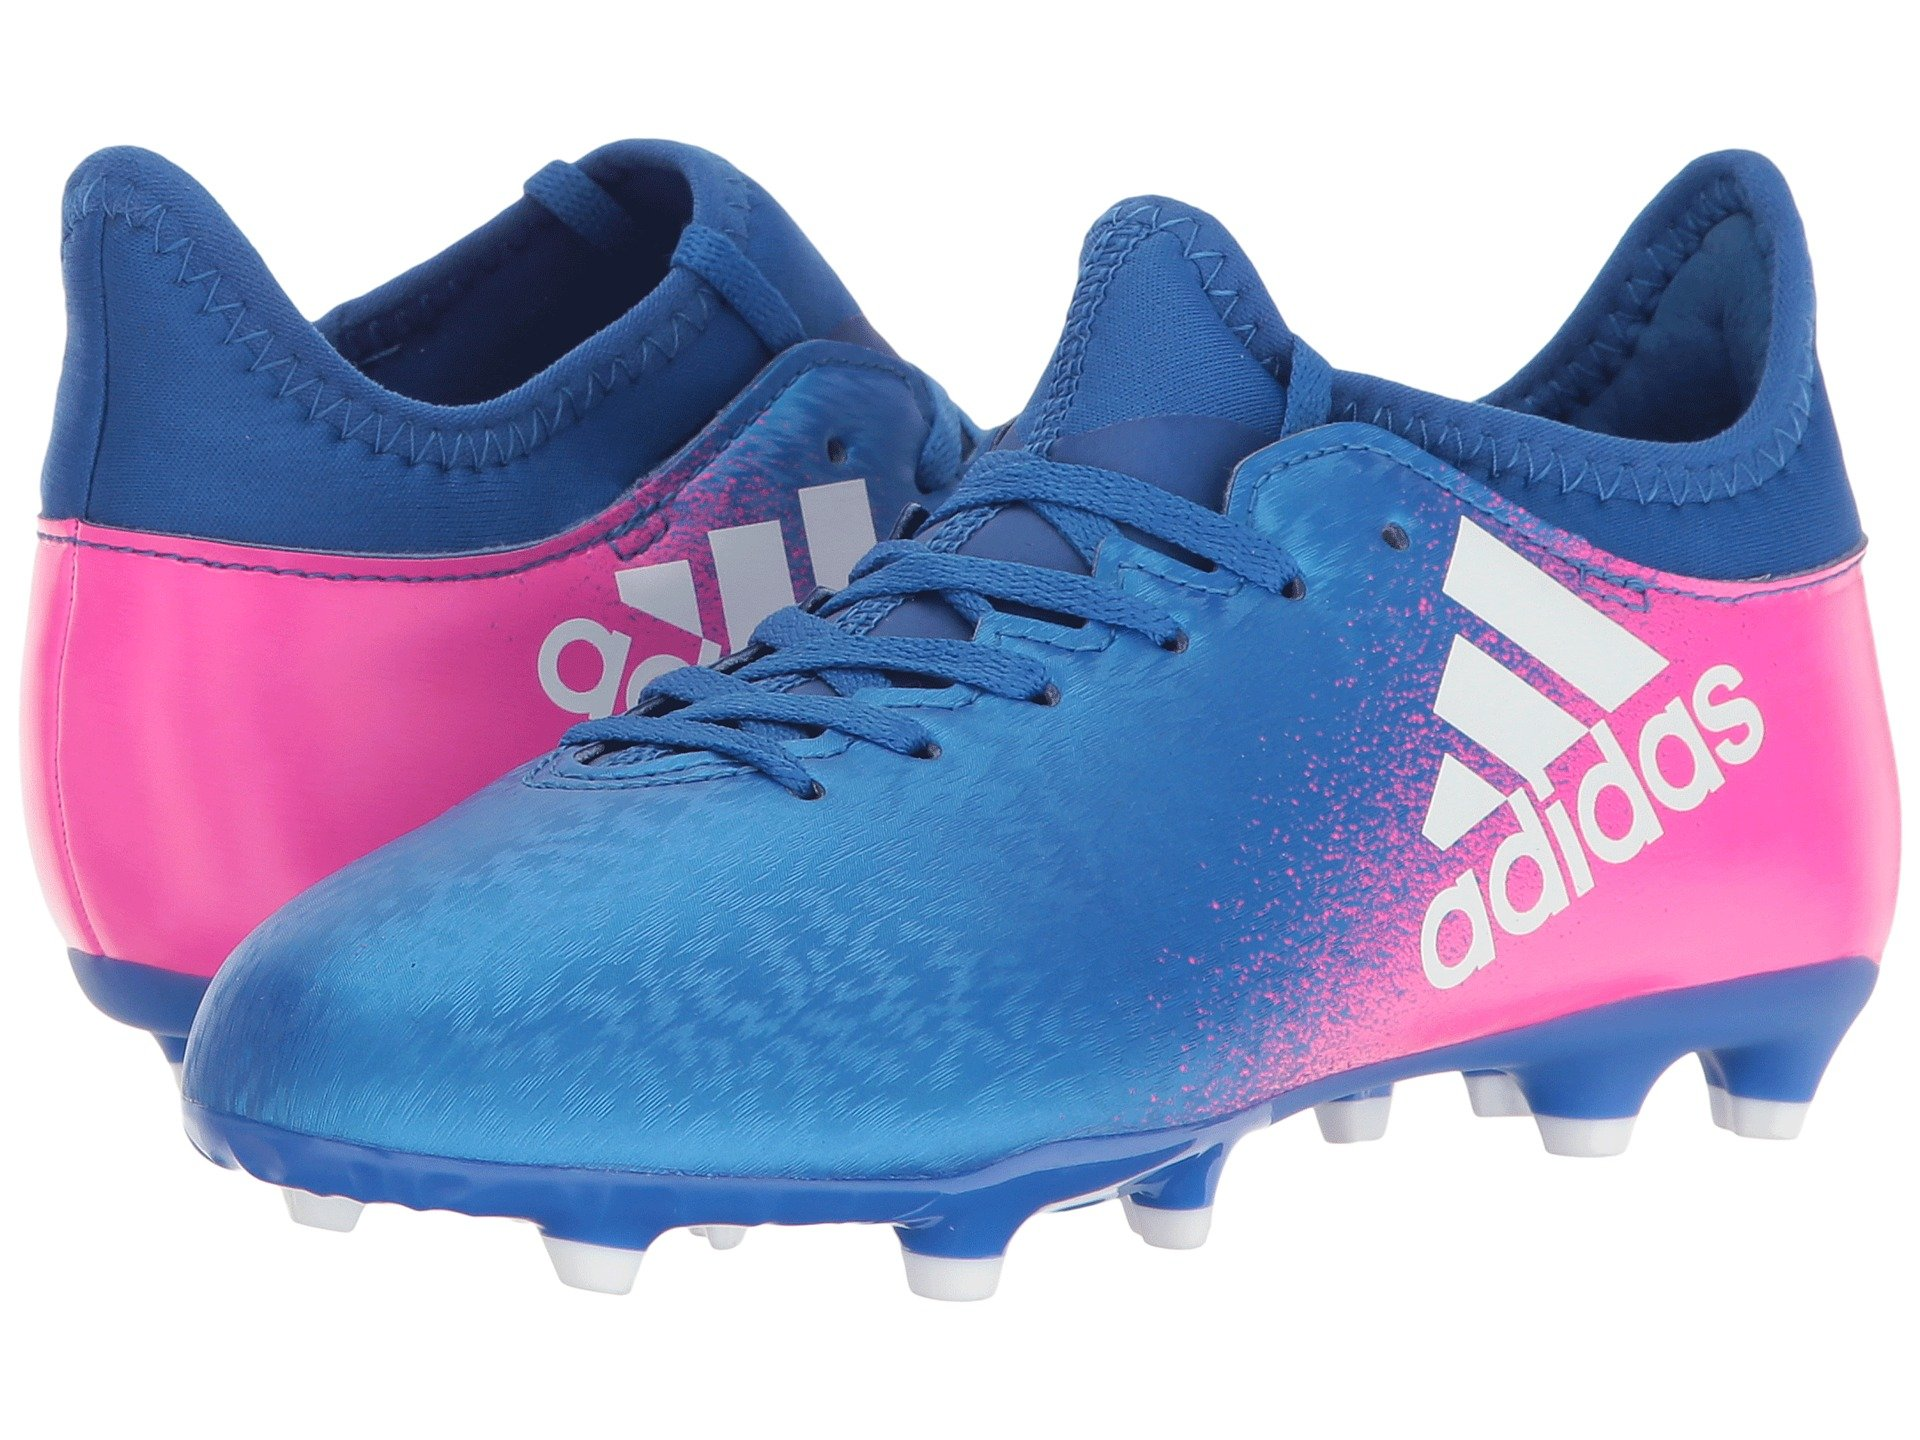 6pm adidas soccer